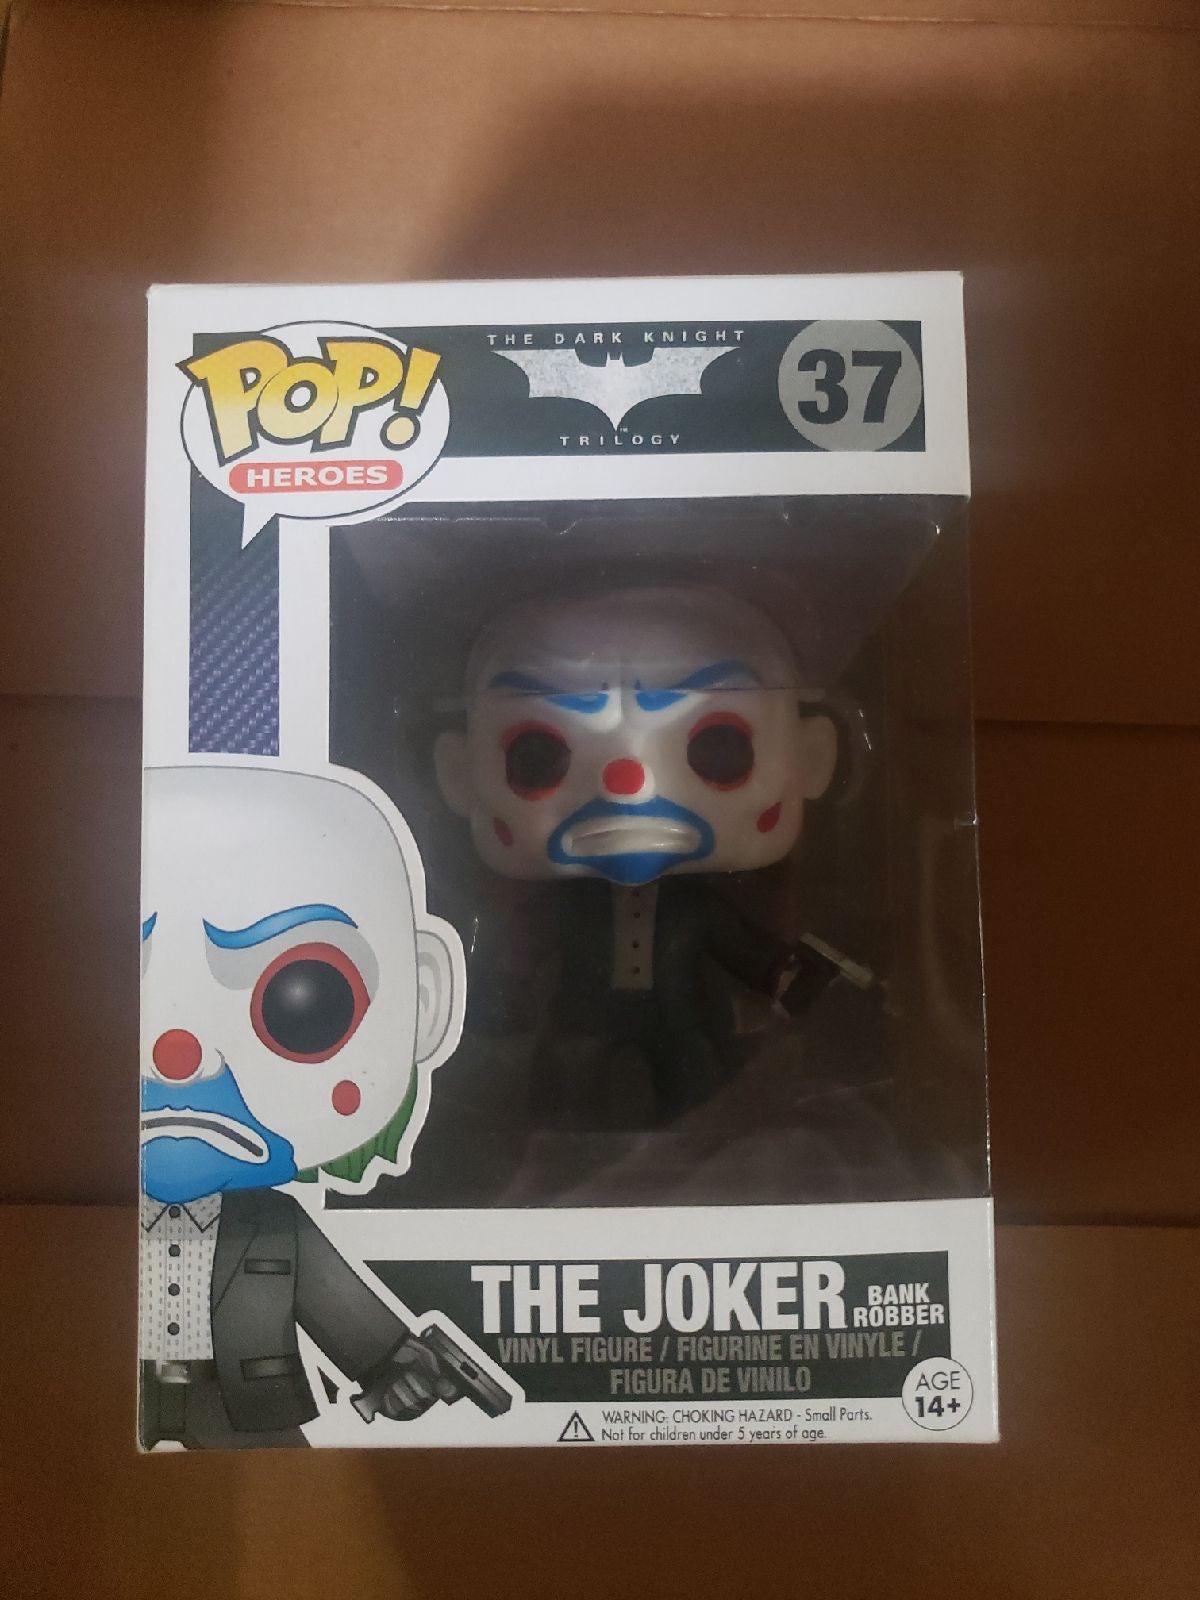 The Joker BANK ROBBER Funko 37 see pics